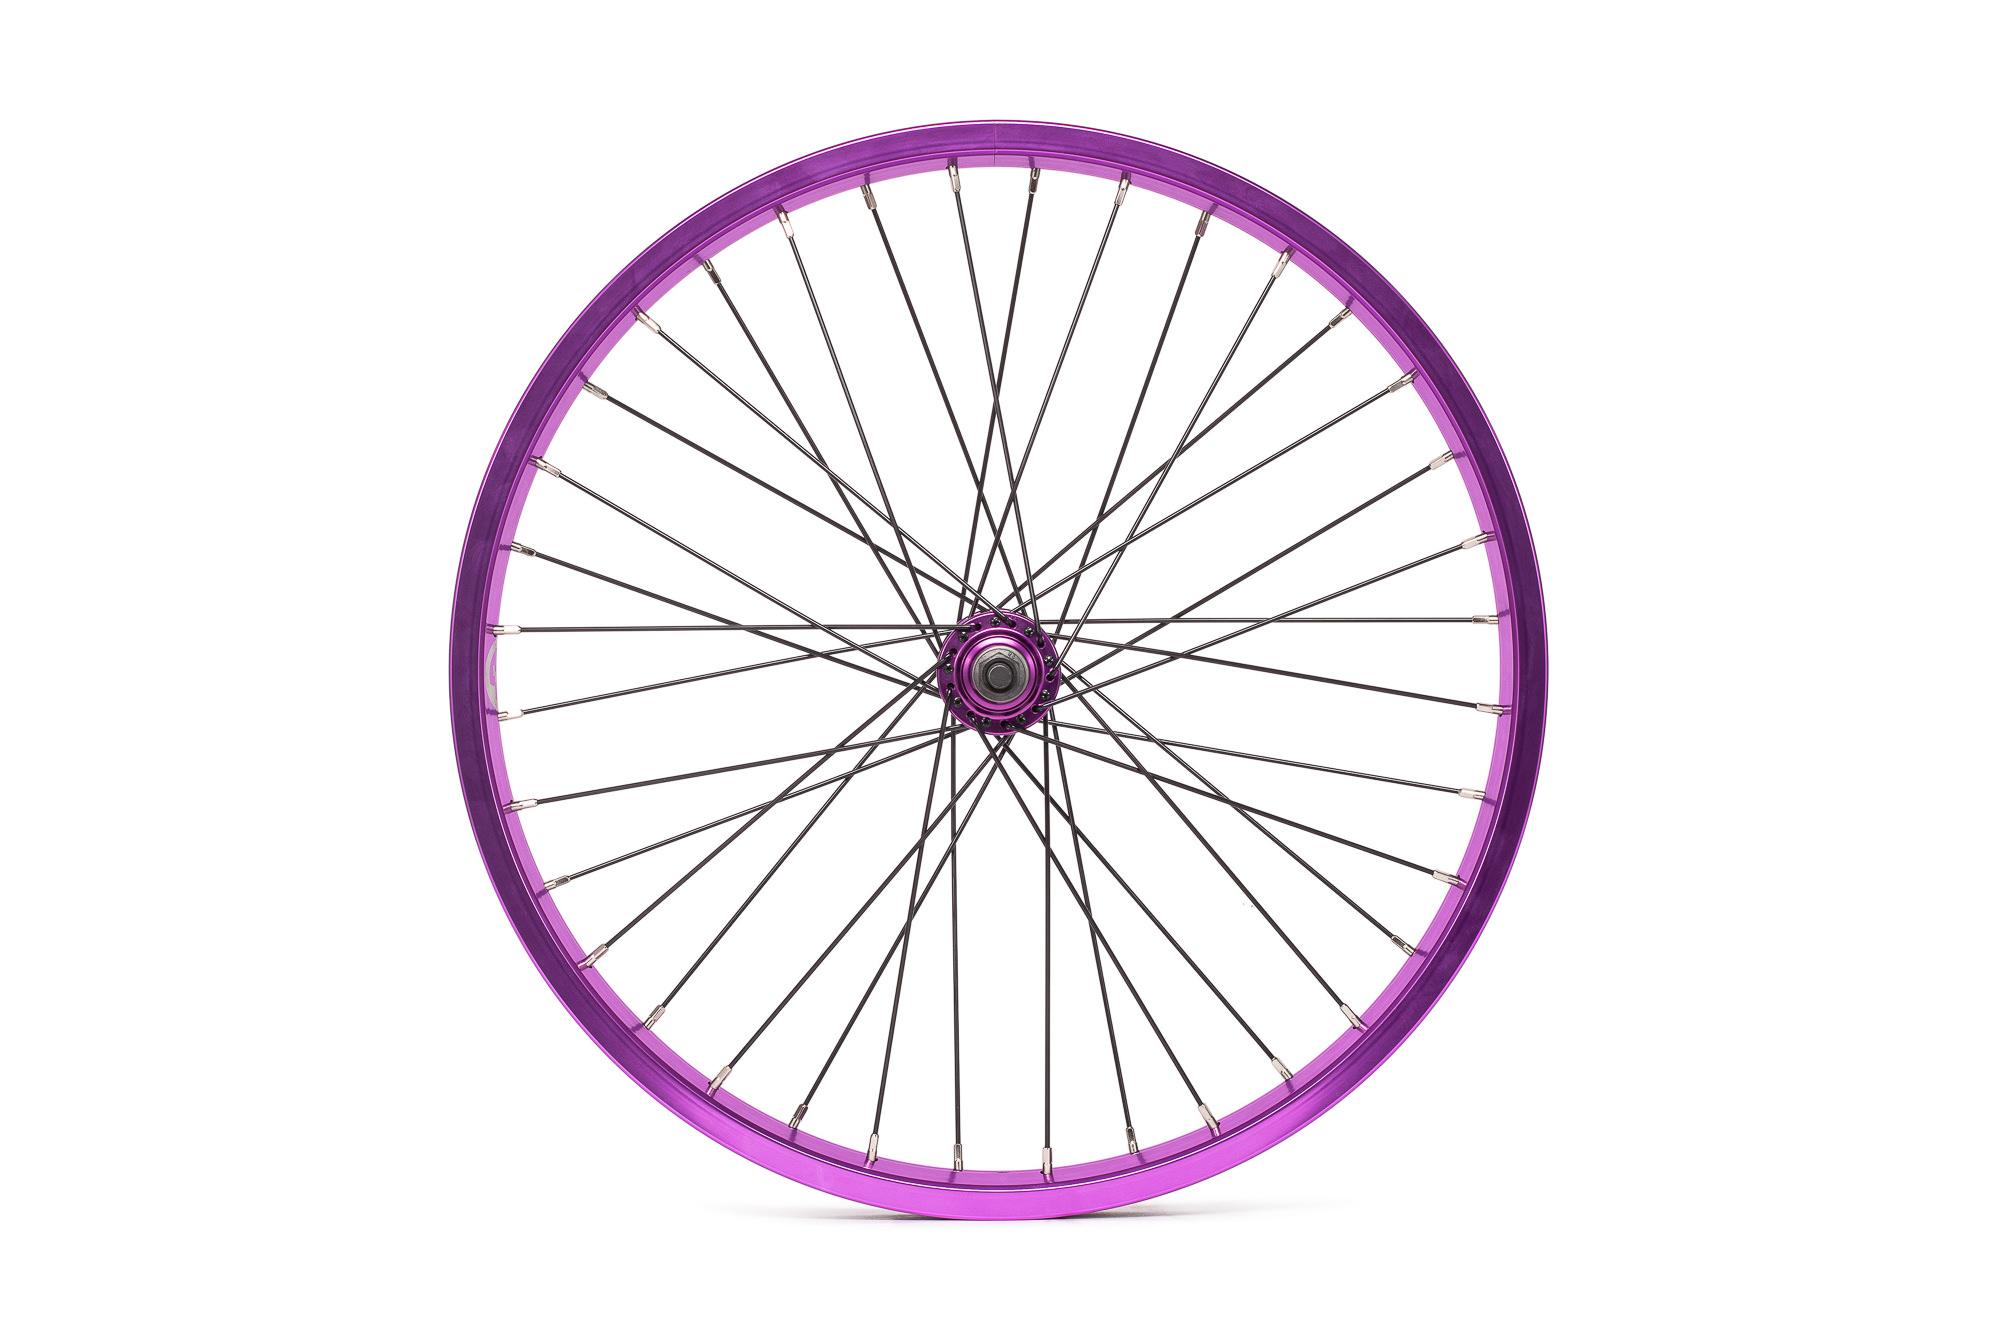 Salt_Everest_front_wheel_purple-01